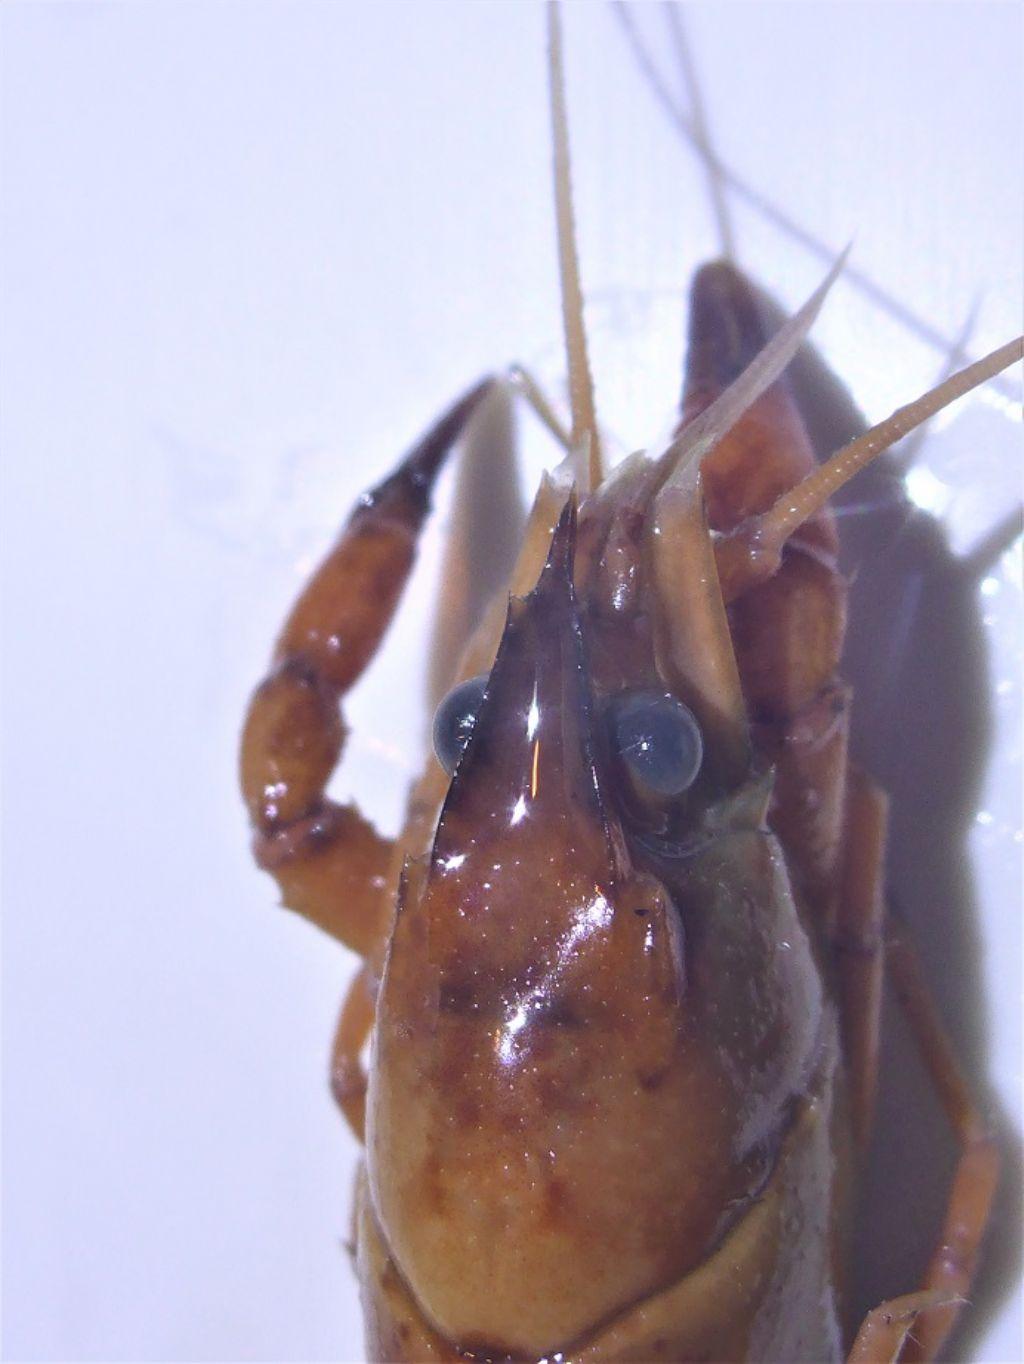 Gambero del Mississipi - Procambarus???